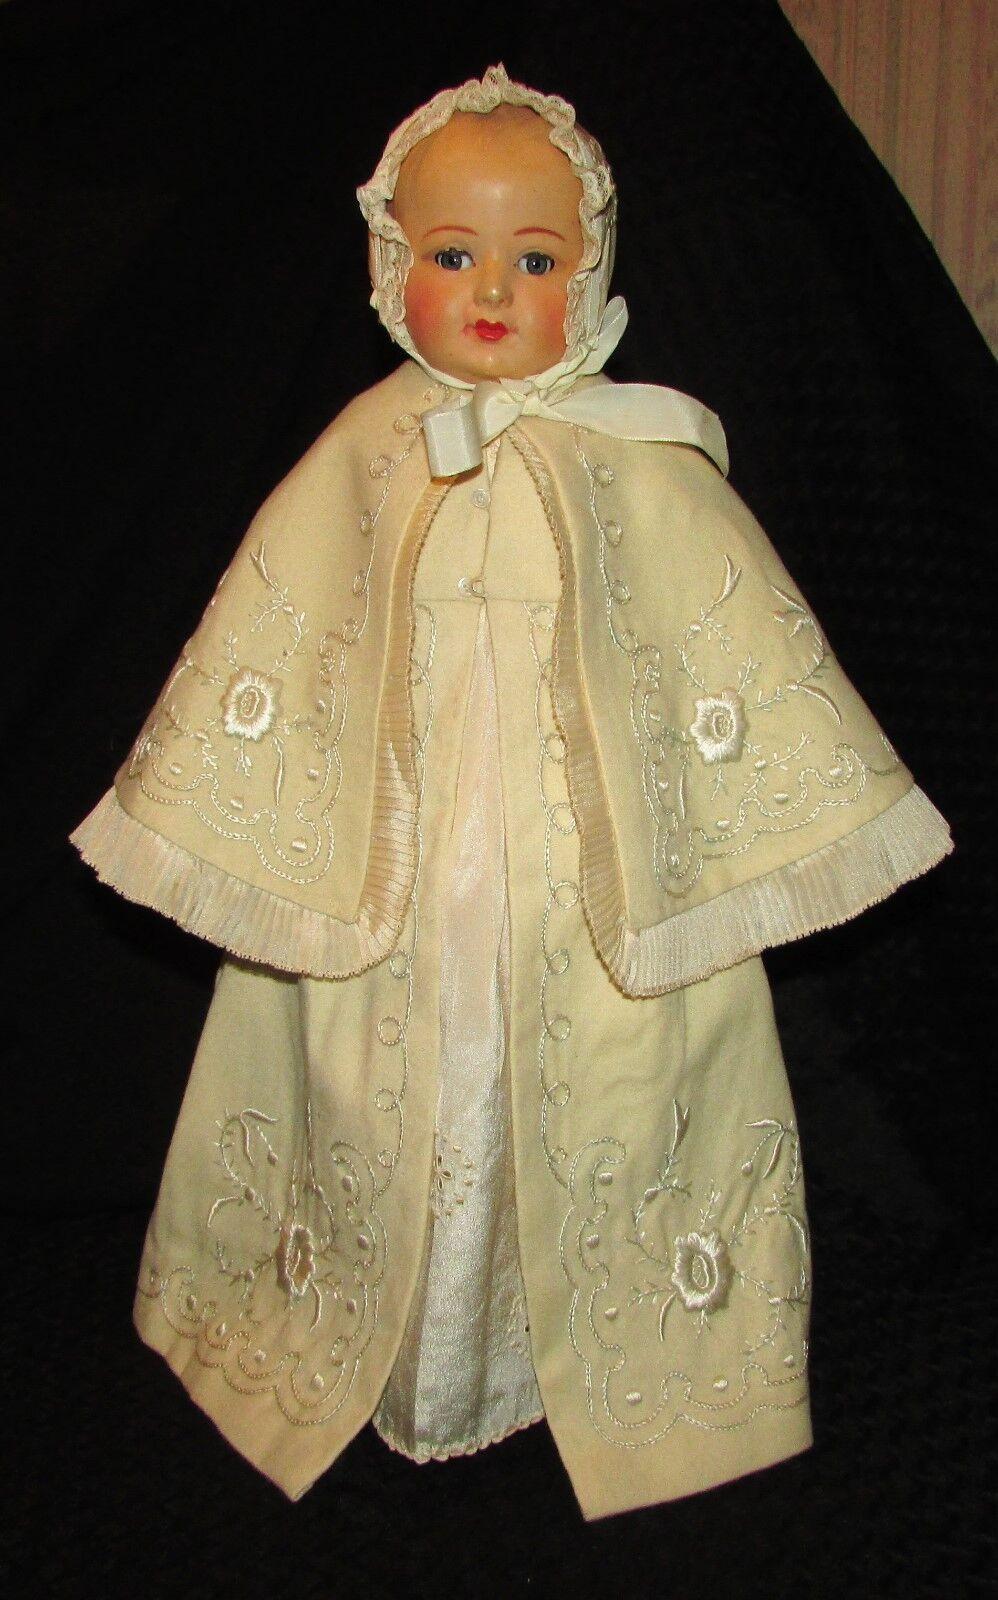 Bañista Antiguo Petitcollin de Vestido de Bautizo Abrigo Bordado Manual